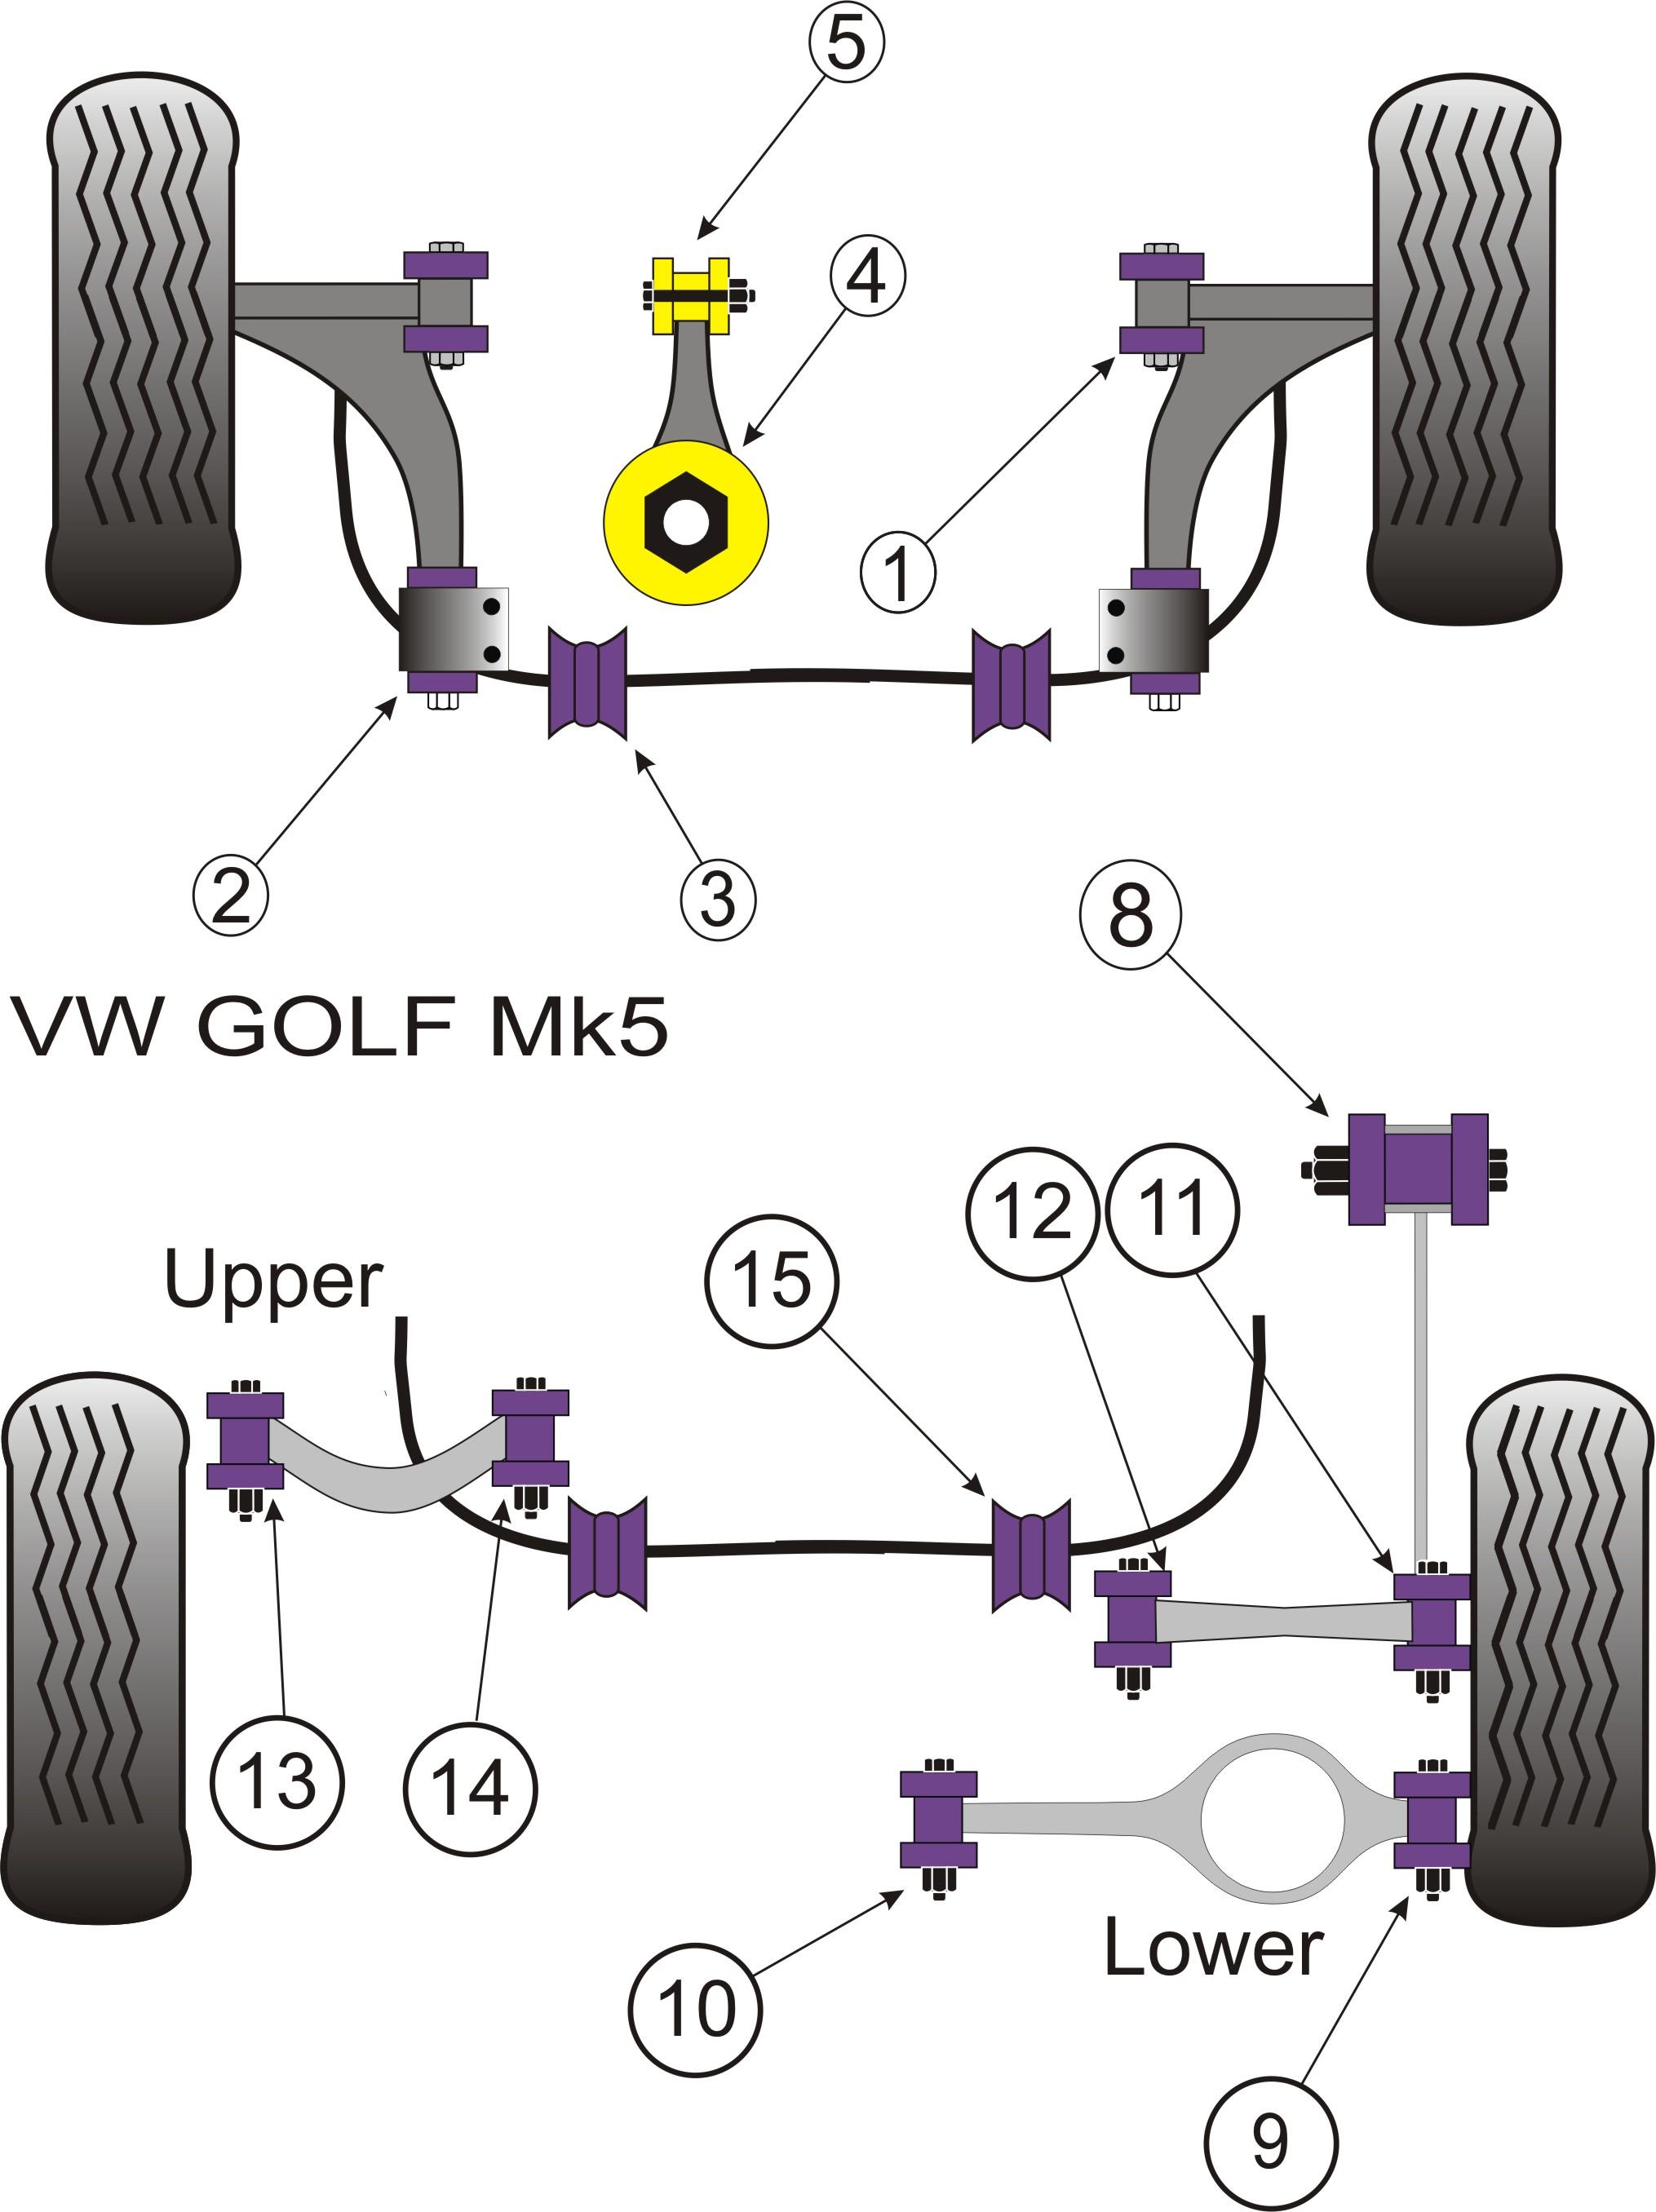 Vw Engine Mount Diagram Wiring Data Volkswagenbeetleenginediagram 2001 Volkswagen Beetle Database Library Type 1 Powerflex Bush Poly For